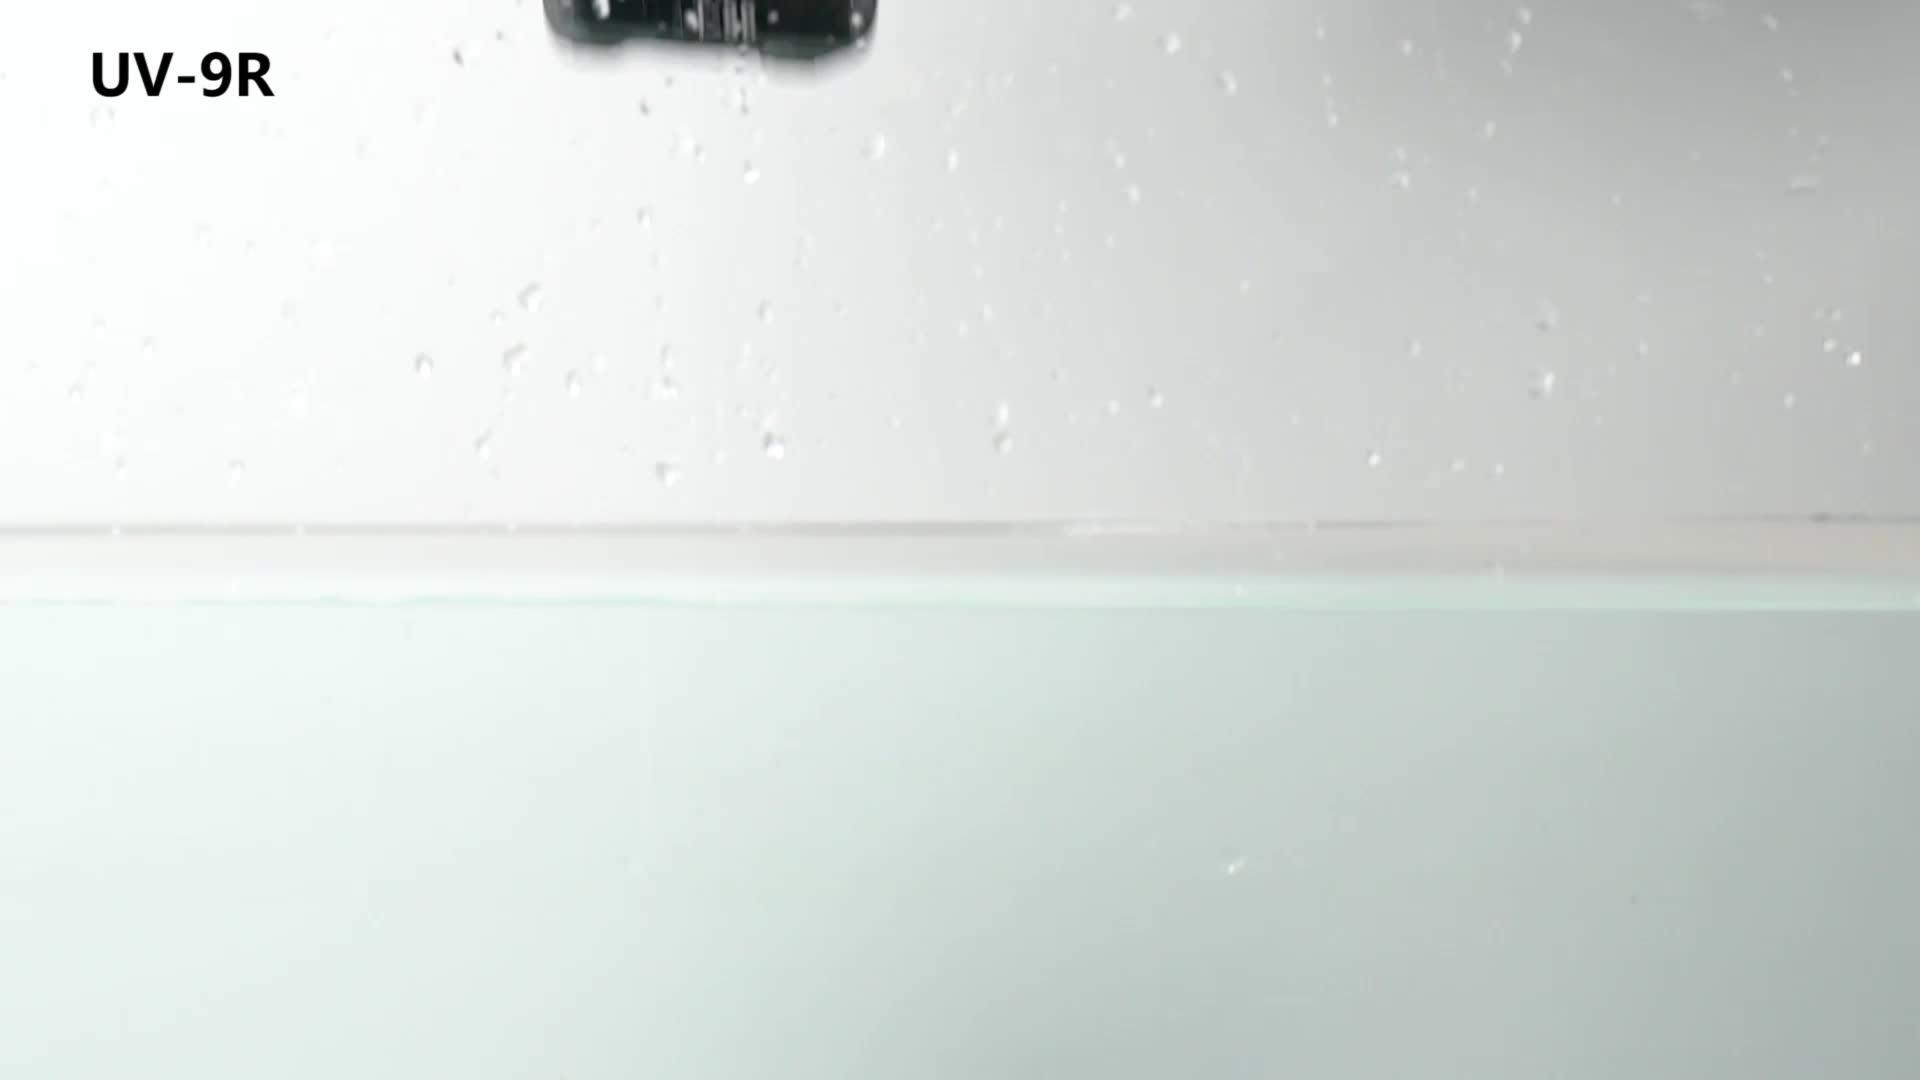 BAOFENG UV-9R עמיד למים כף יד משדר Baofeng מכשיר קשר Baofeng UV-9R